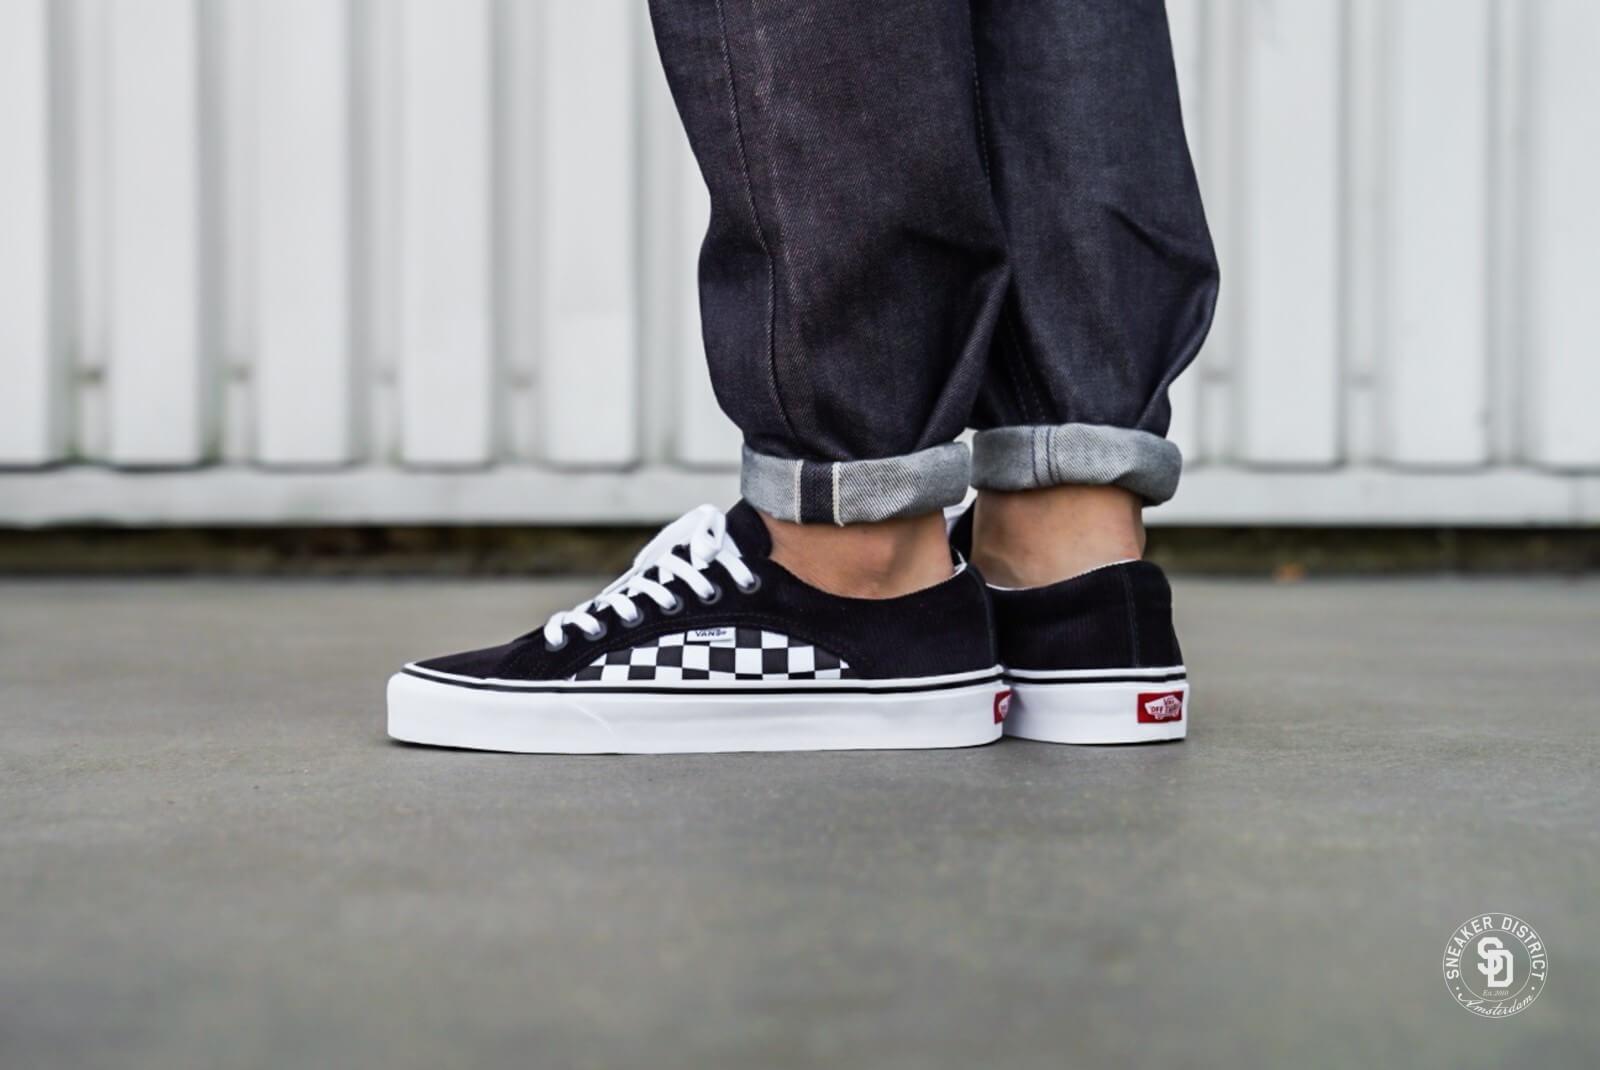 Vans Lampin Checkerboard/Corduroy Black